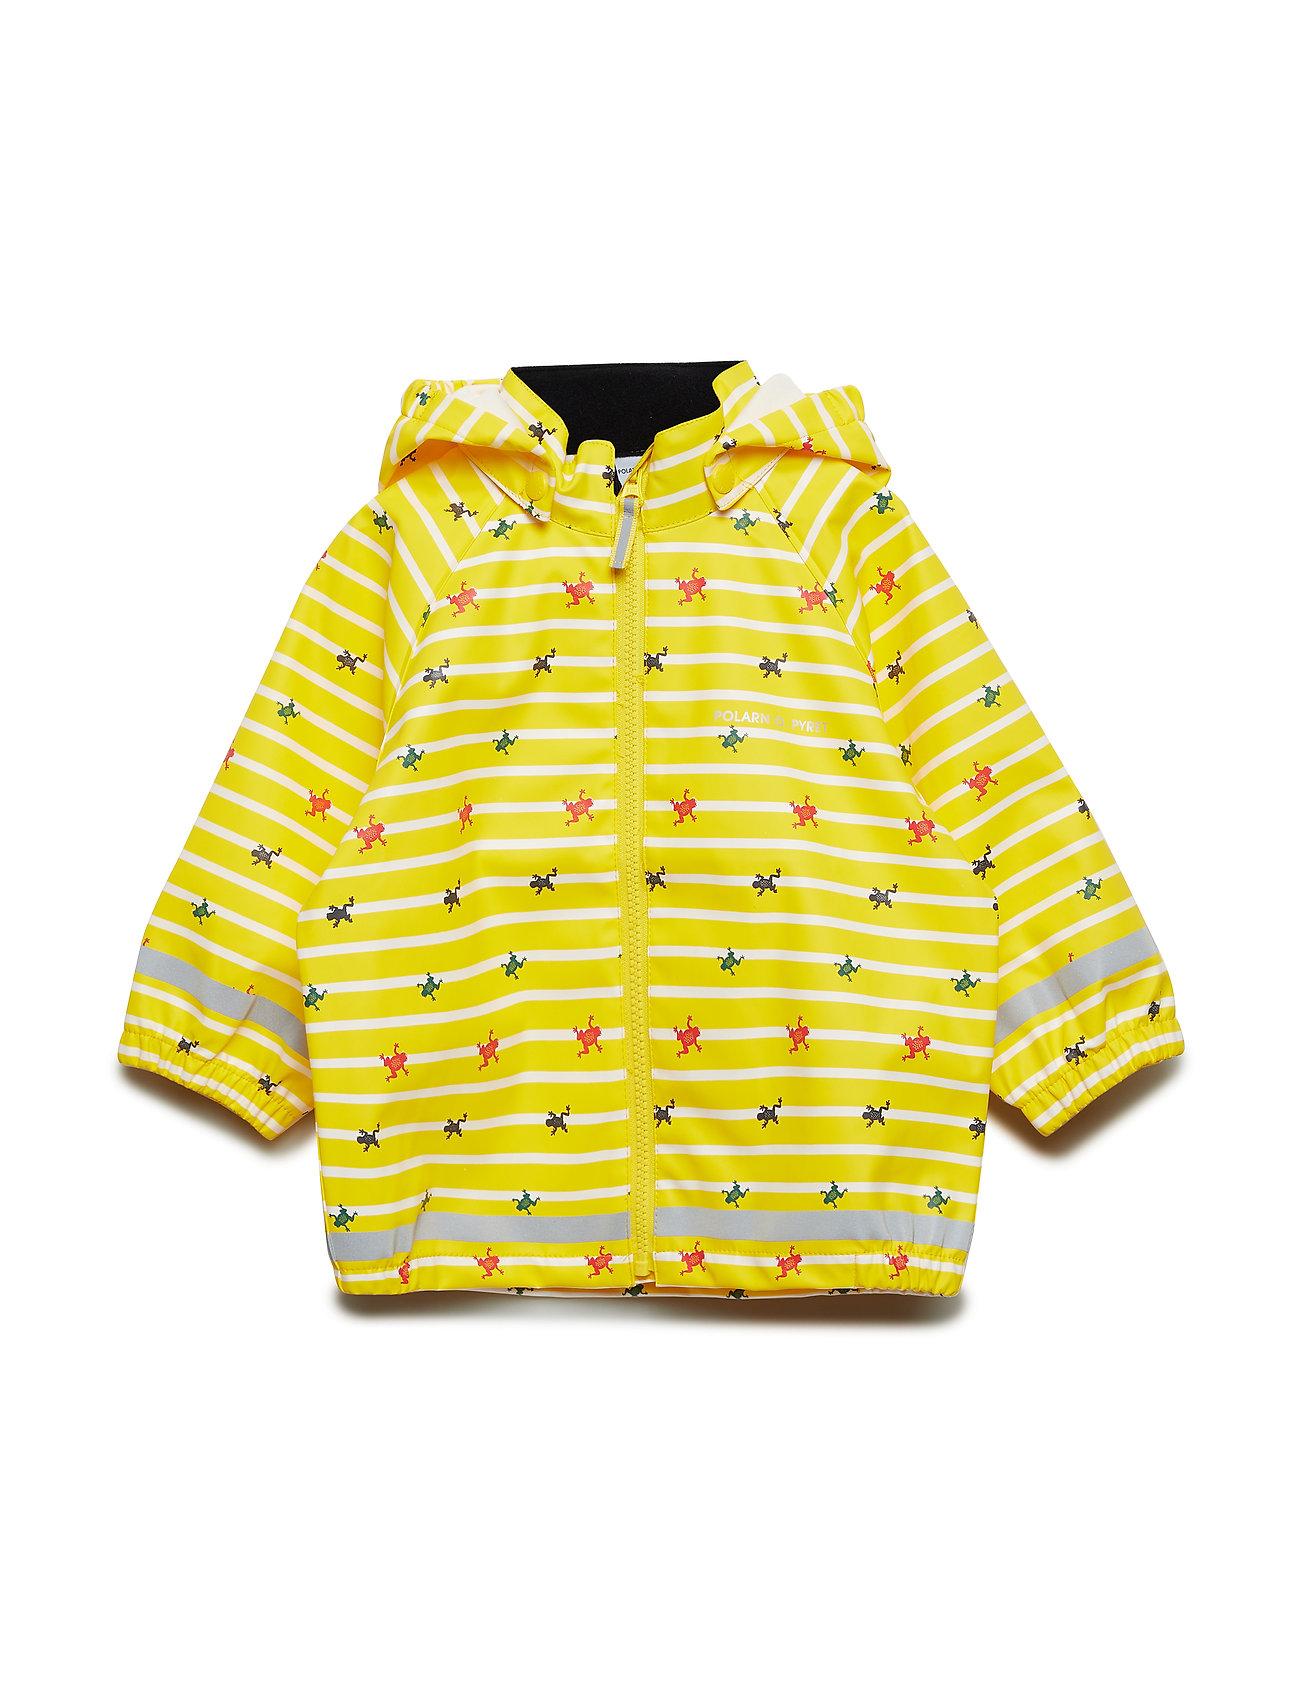 Polarn O. Pyret Waterproof Rain Jacket